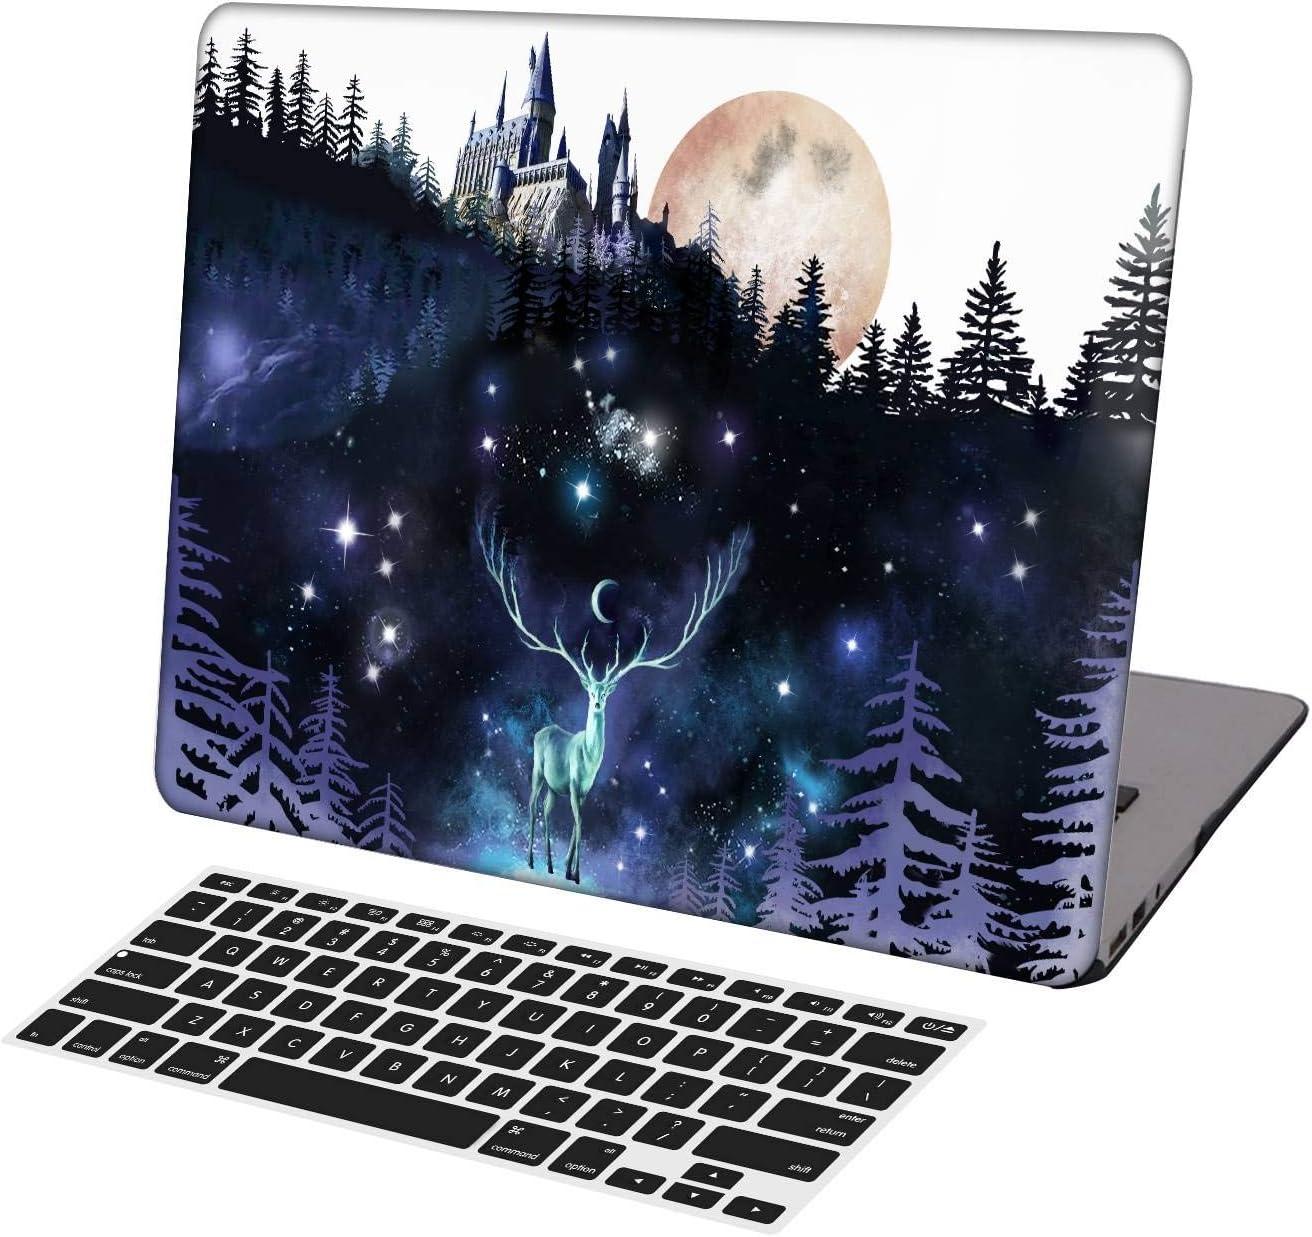 KSK KAISHEK Laptop Case for MacBook 2016-2019 15 inch Pro Releas Ranking TOP7 free